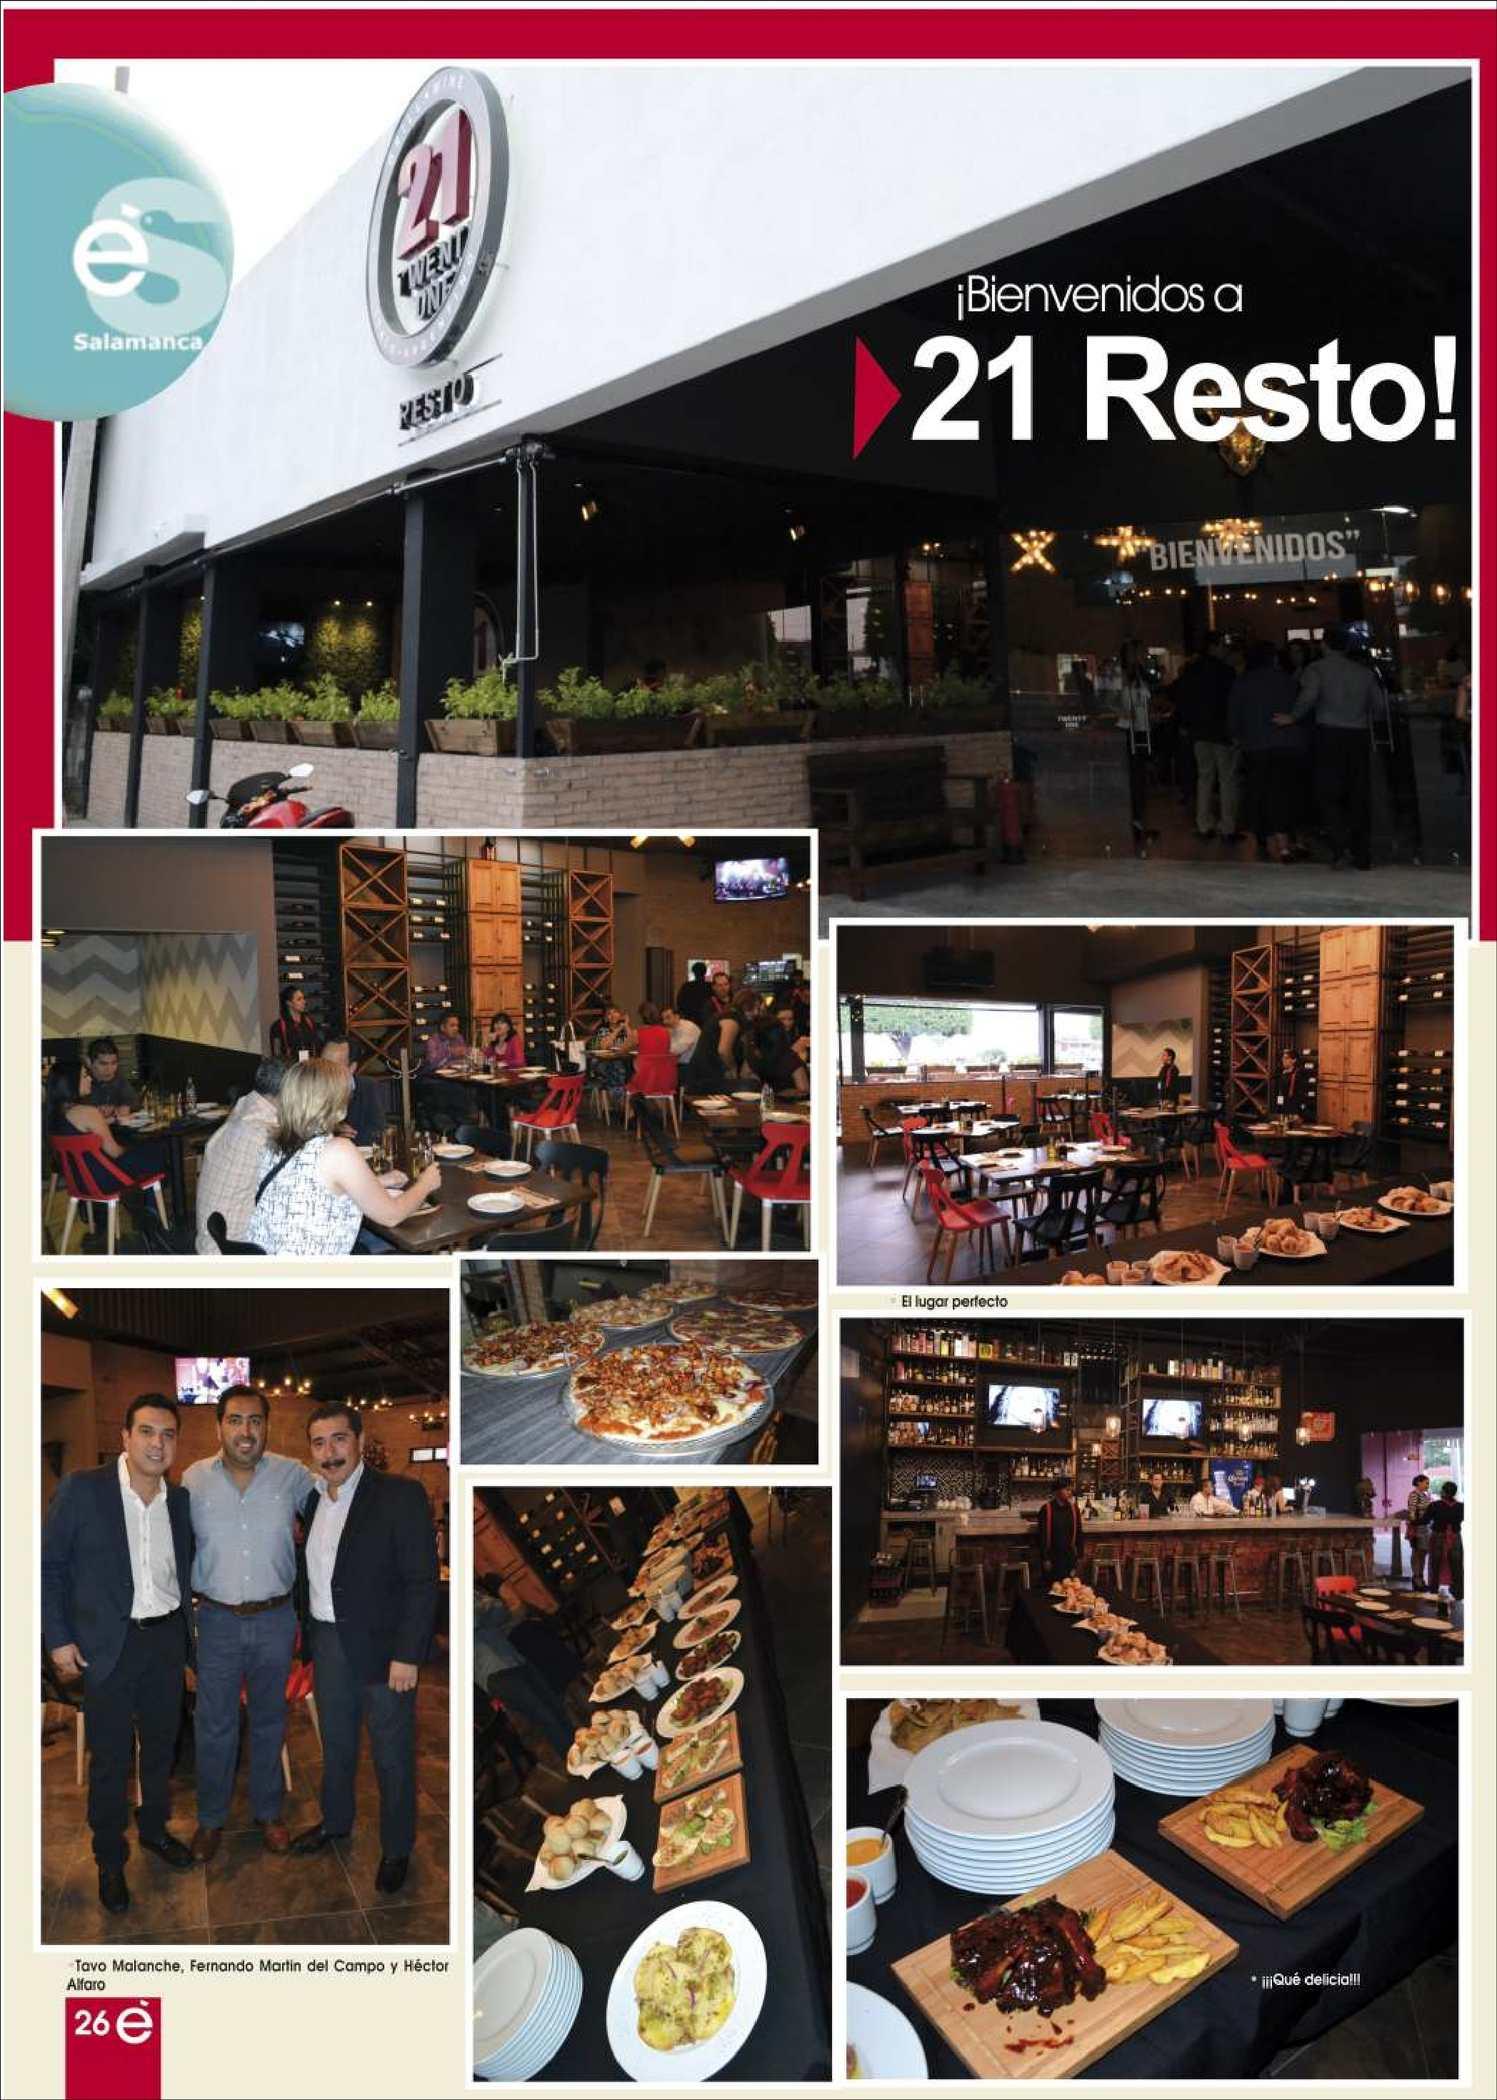 Lite Metropolitan Irapuato Y Salamanca 525 Calameo Downloader # Muebles Suarez Belmonte De Miranda